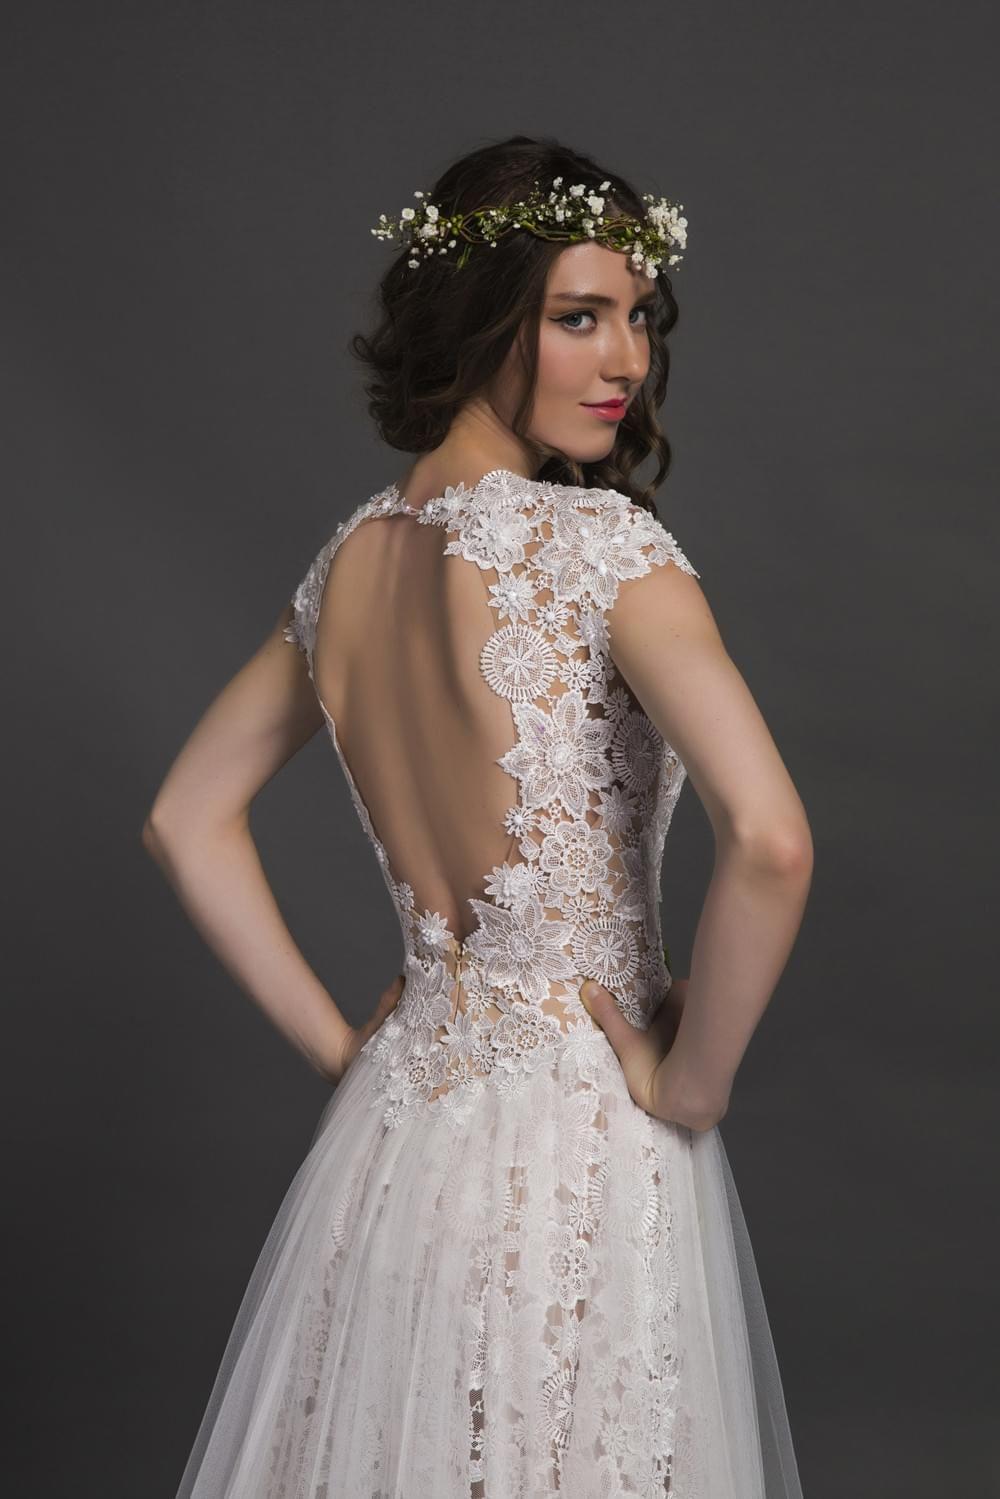 Lightweight wedding dresses  Open back floral lace aline light weight sheath dress rustic